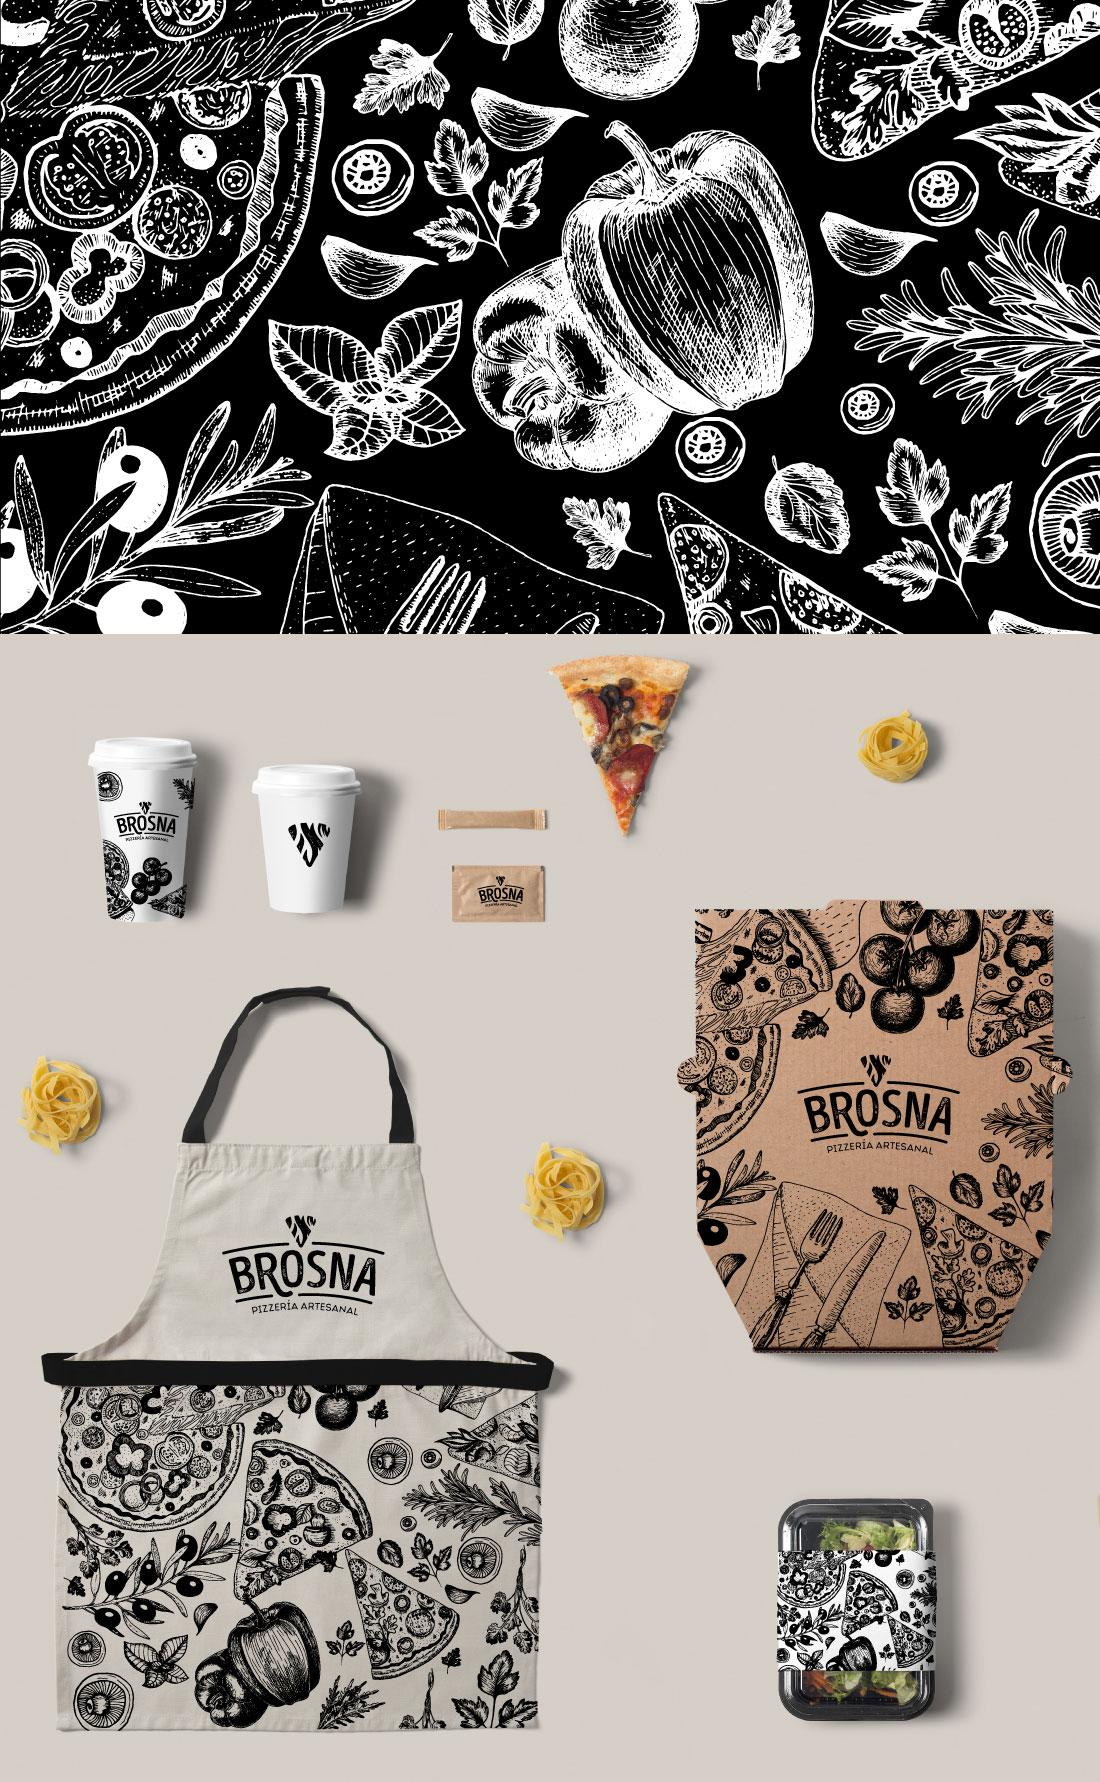 Brosna Pizería artesanal construcción de marca(branding) para negocio de pizzas